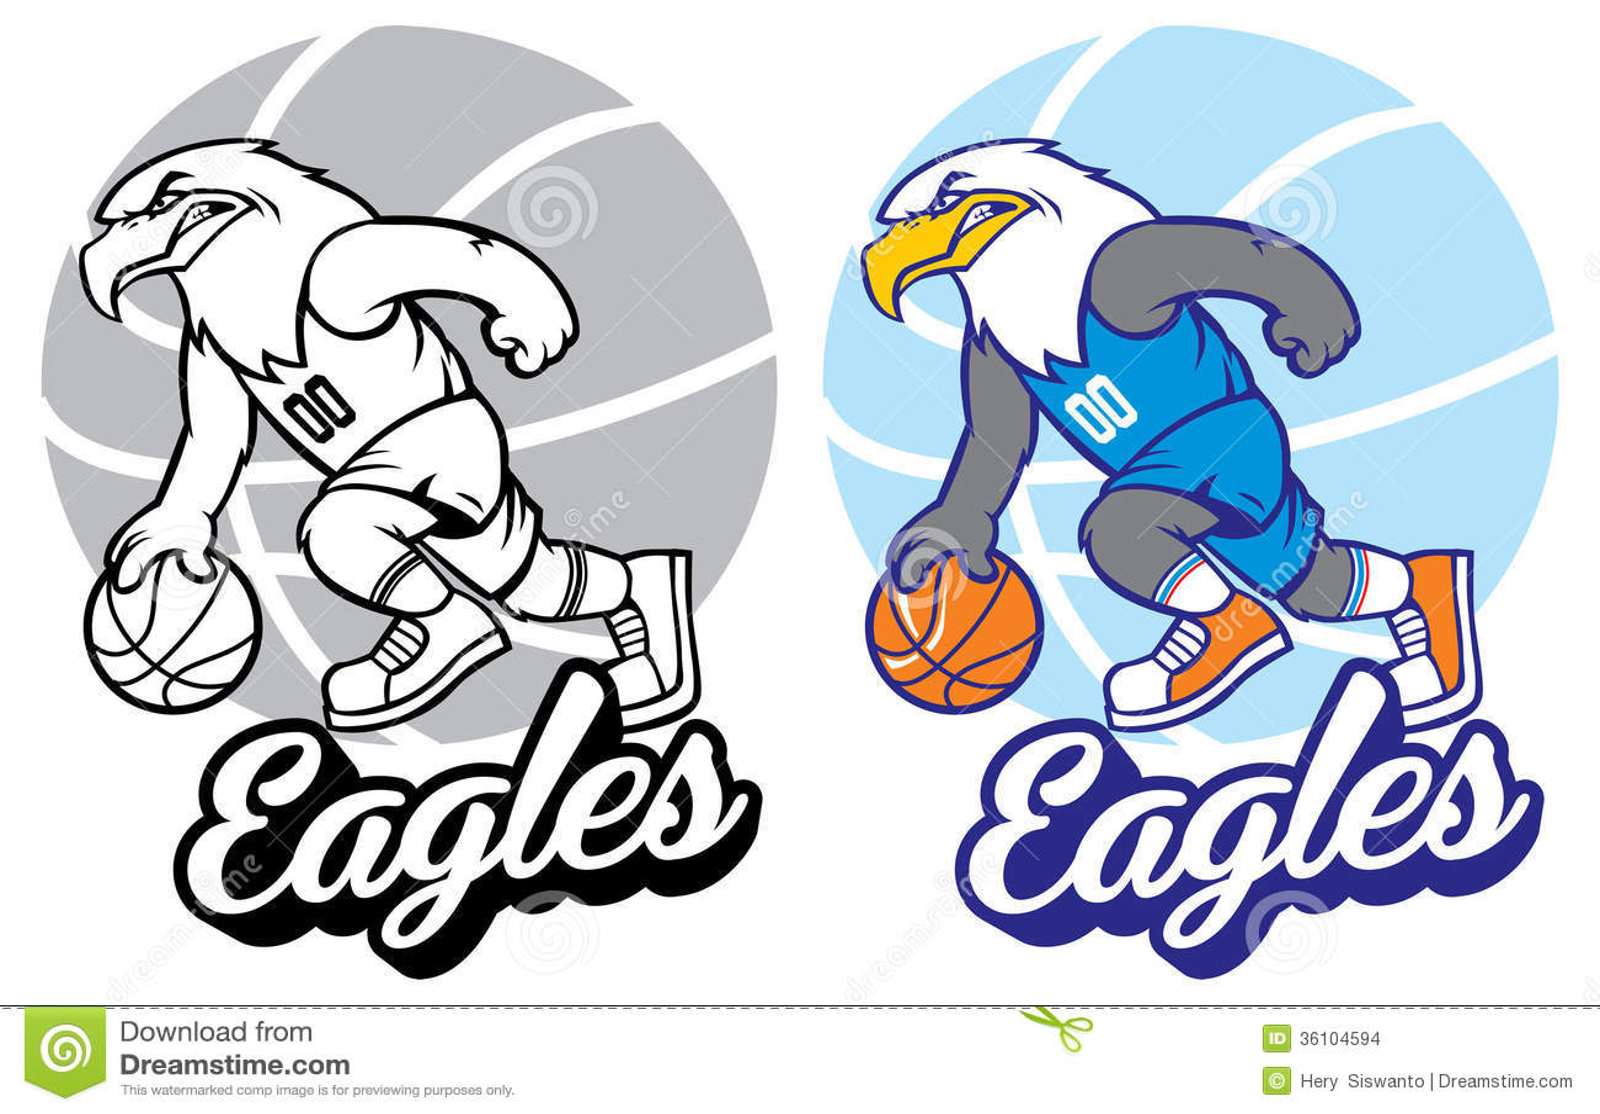 Eagle Basketball Mascot Stock Images - Image: 36104594